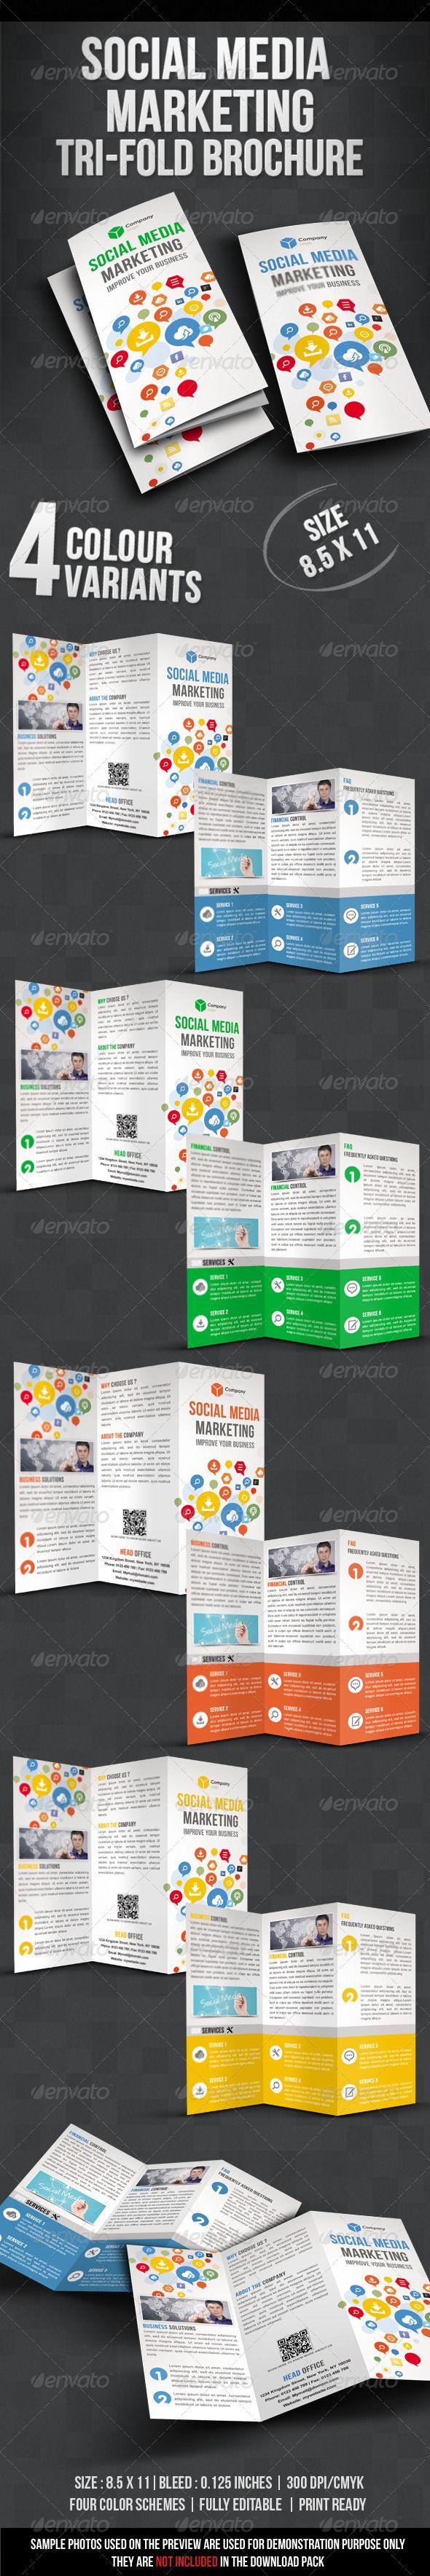 background check marketing tri fold flyers aildoc productoseb co